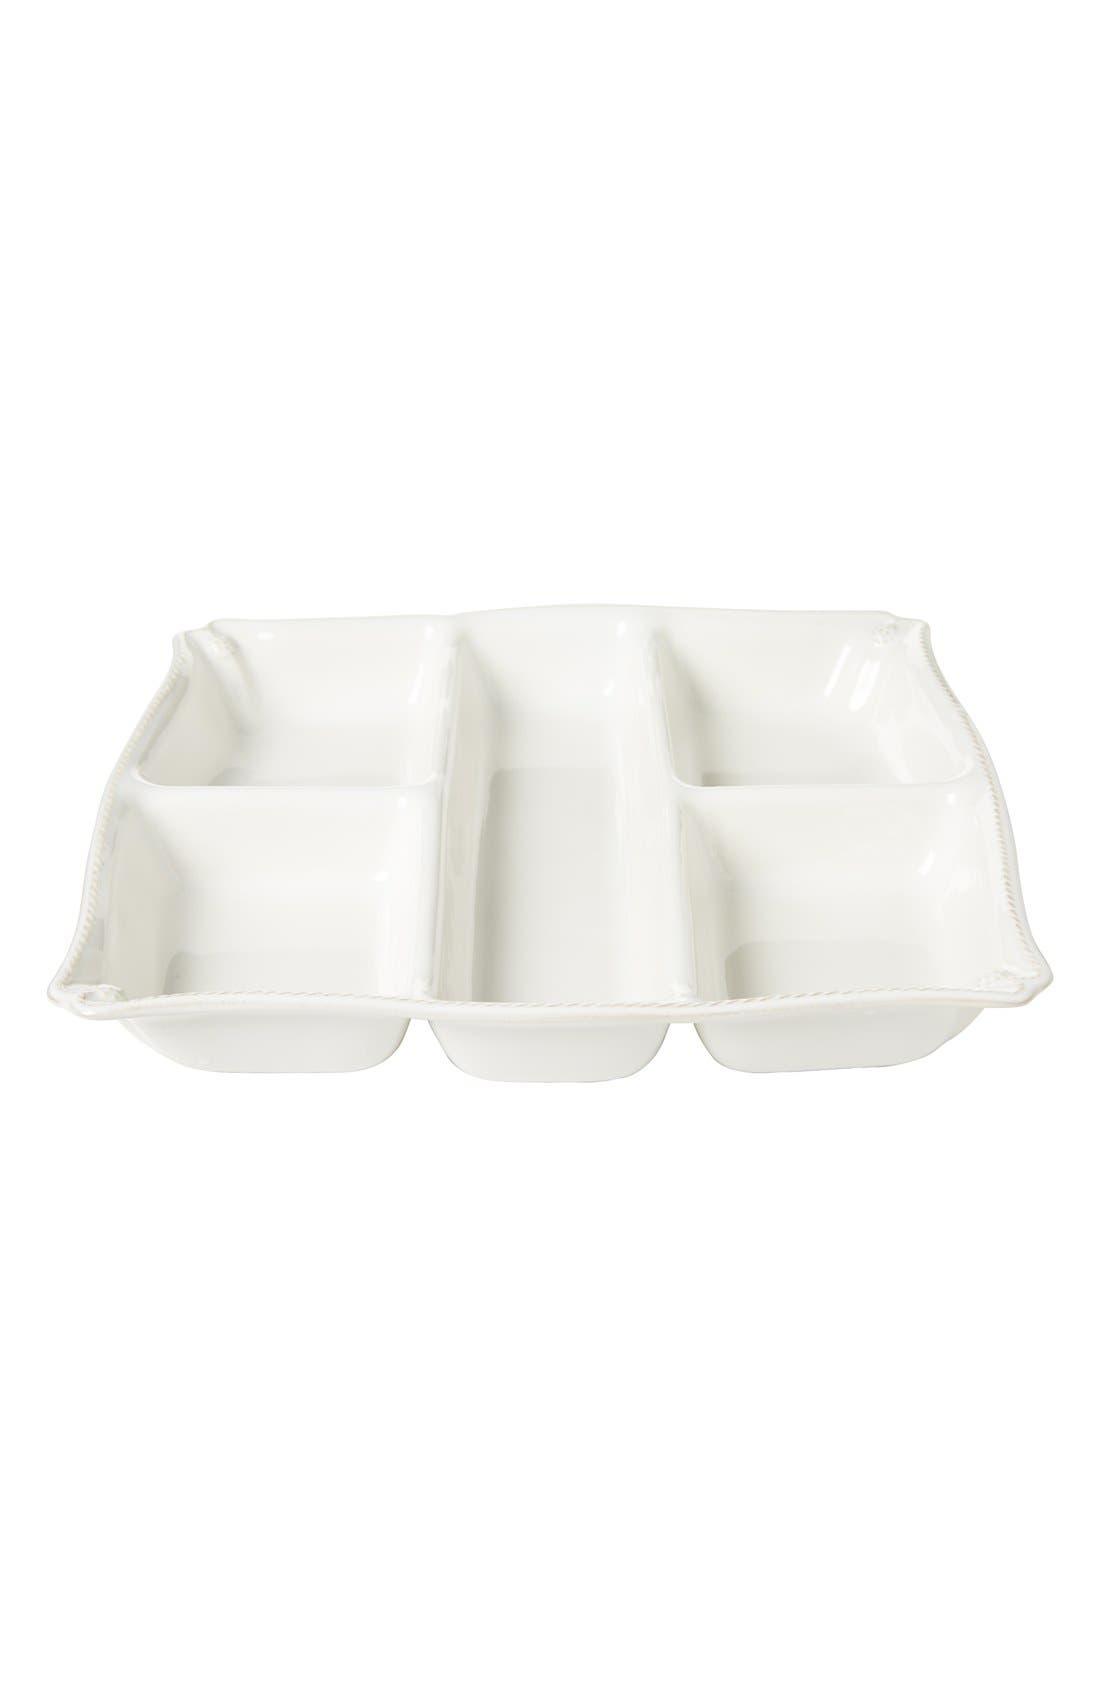 Alternate Image 3  - Juliska'Berry and Thread' Ceramic Appetizer Platter